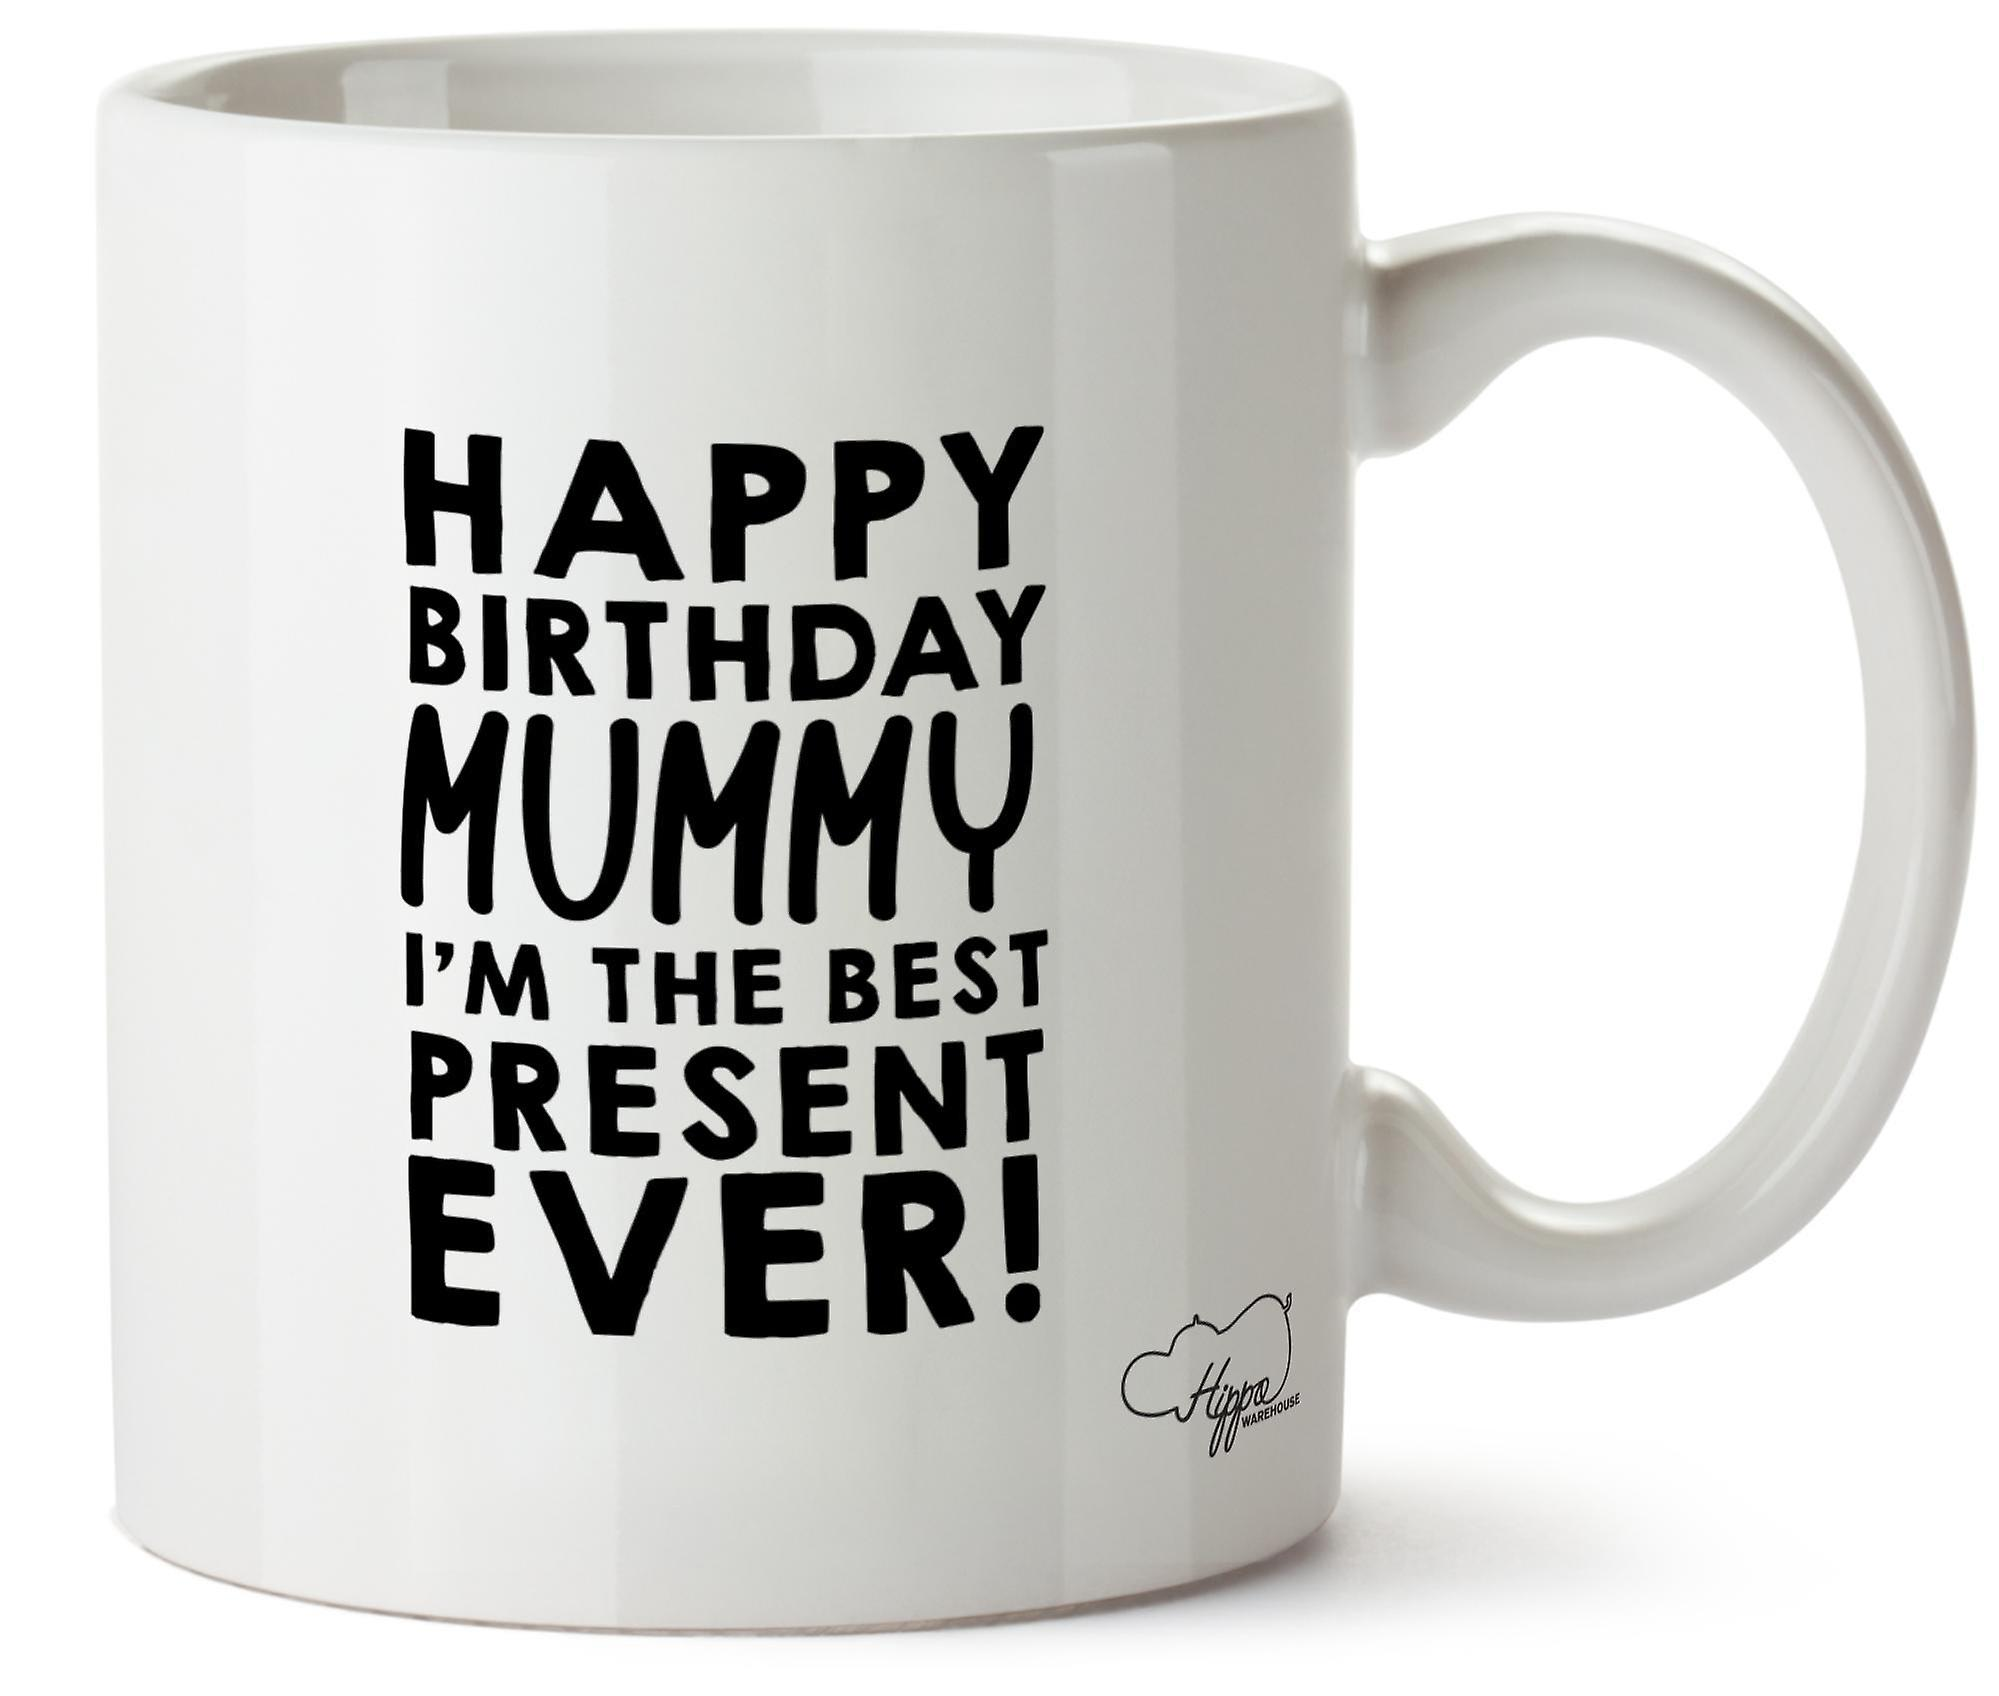 Hippowarehouse Happy Birthday Mummy I'm The Best Present Ever! Printed Mug Cup Ceramic 10oz